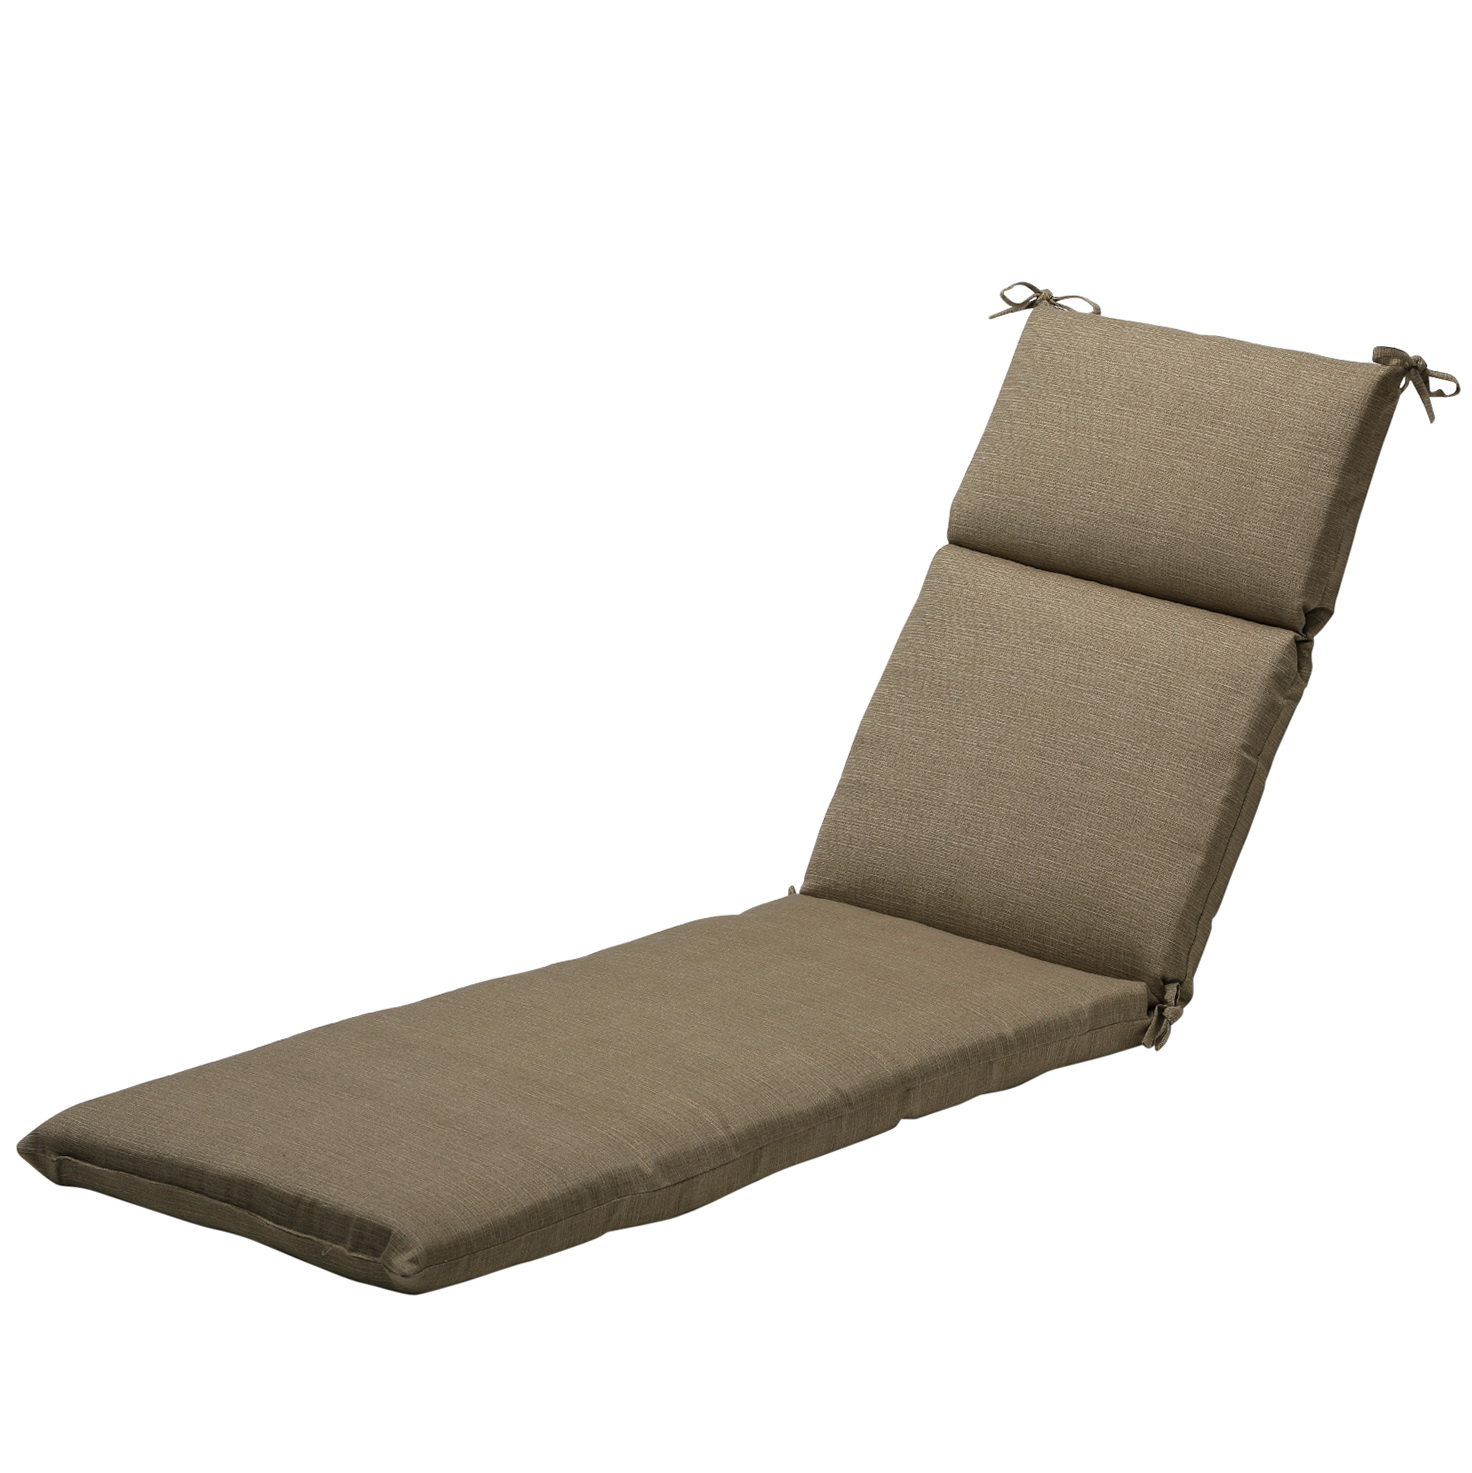 Chaise Lounge Chair Cushions Clearance